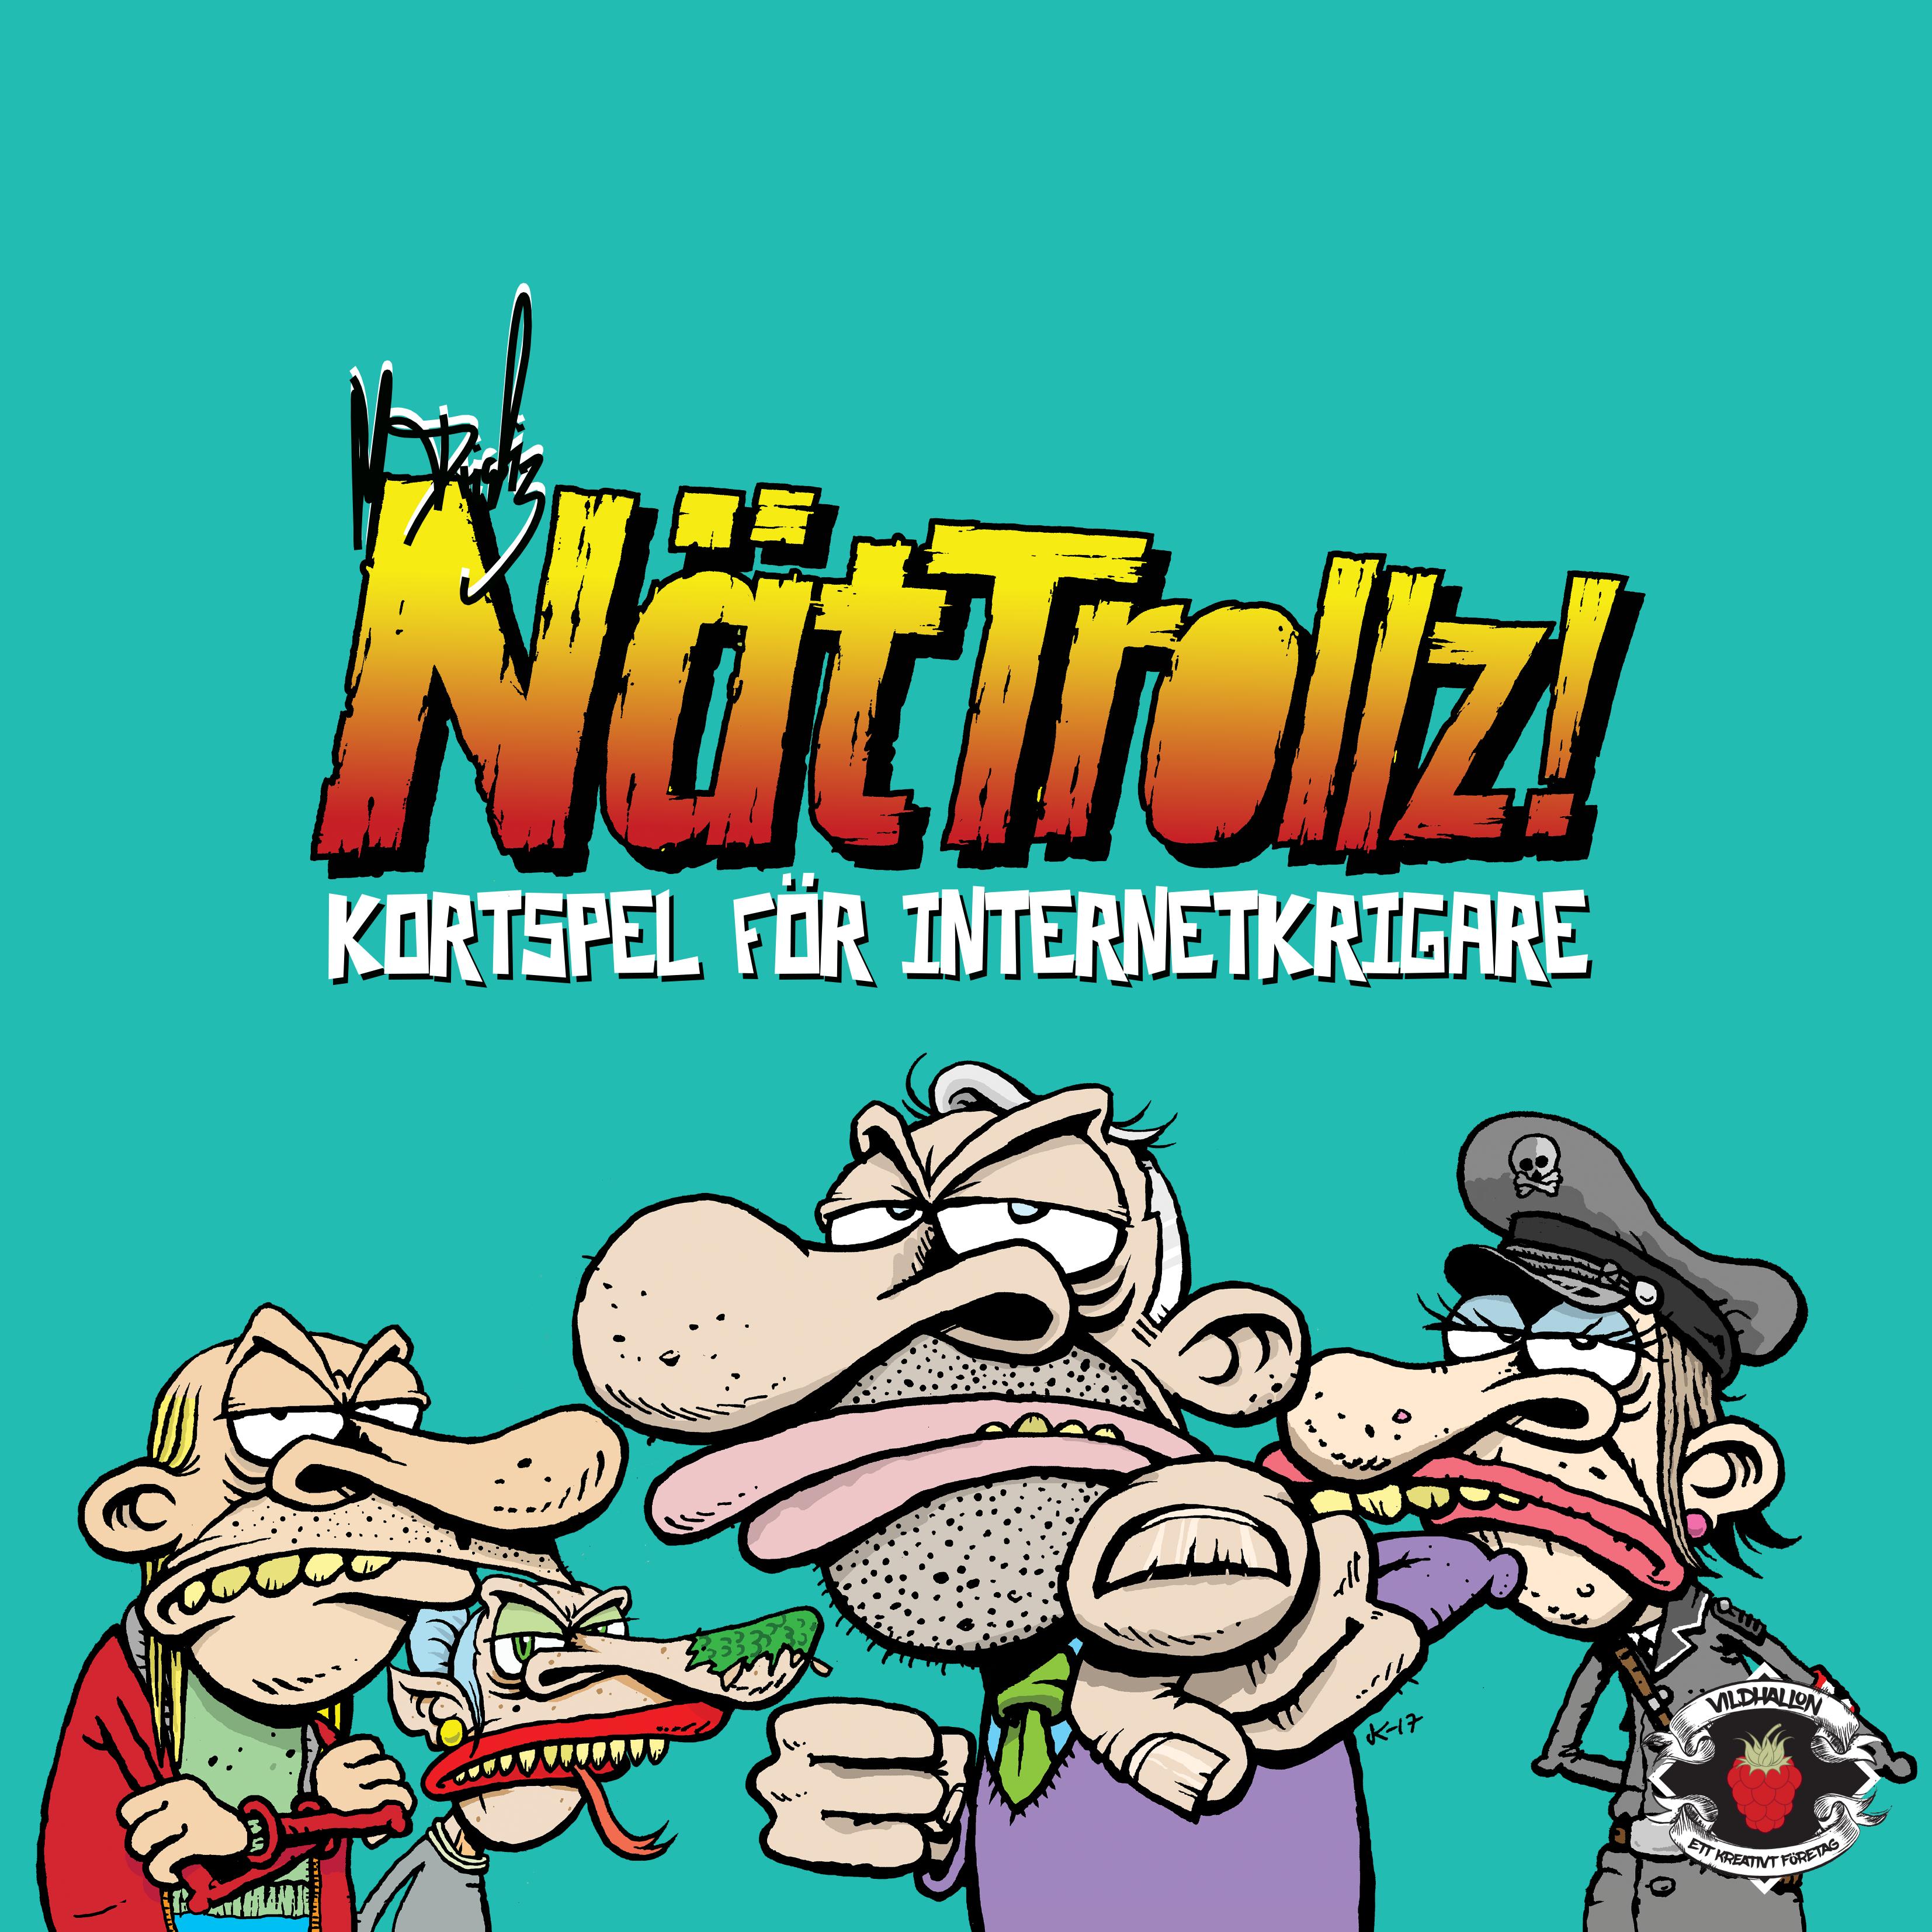 [Partykortspel] NätTrollz! VILD006